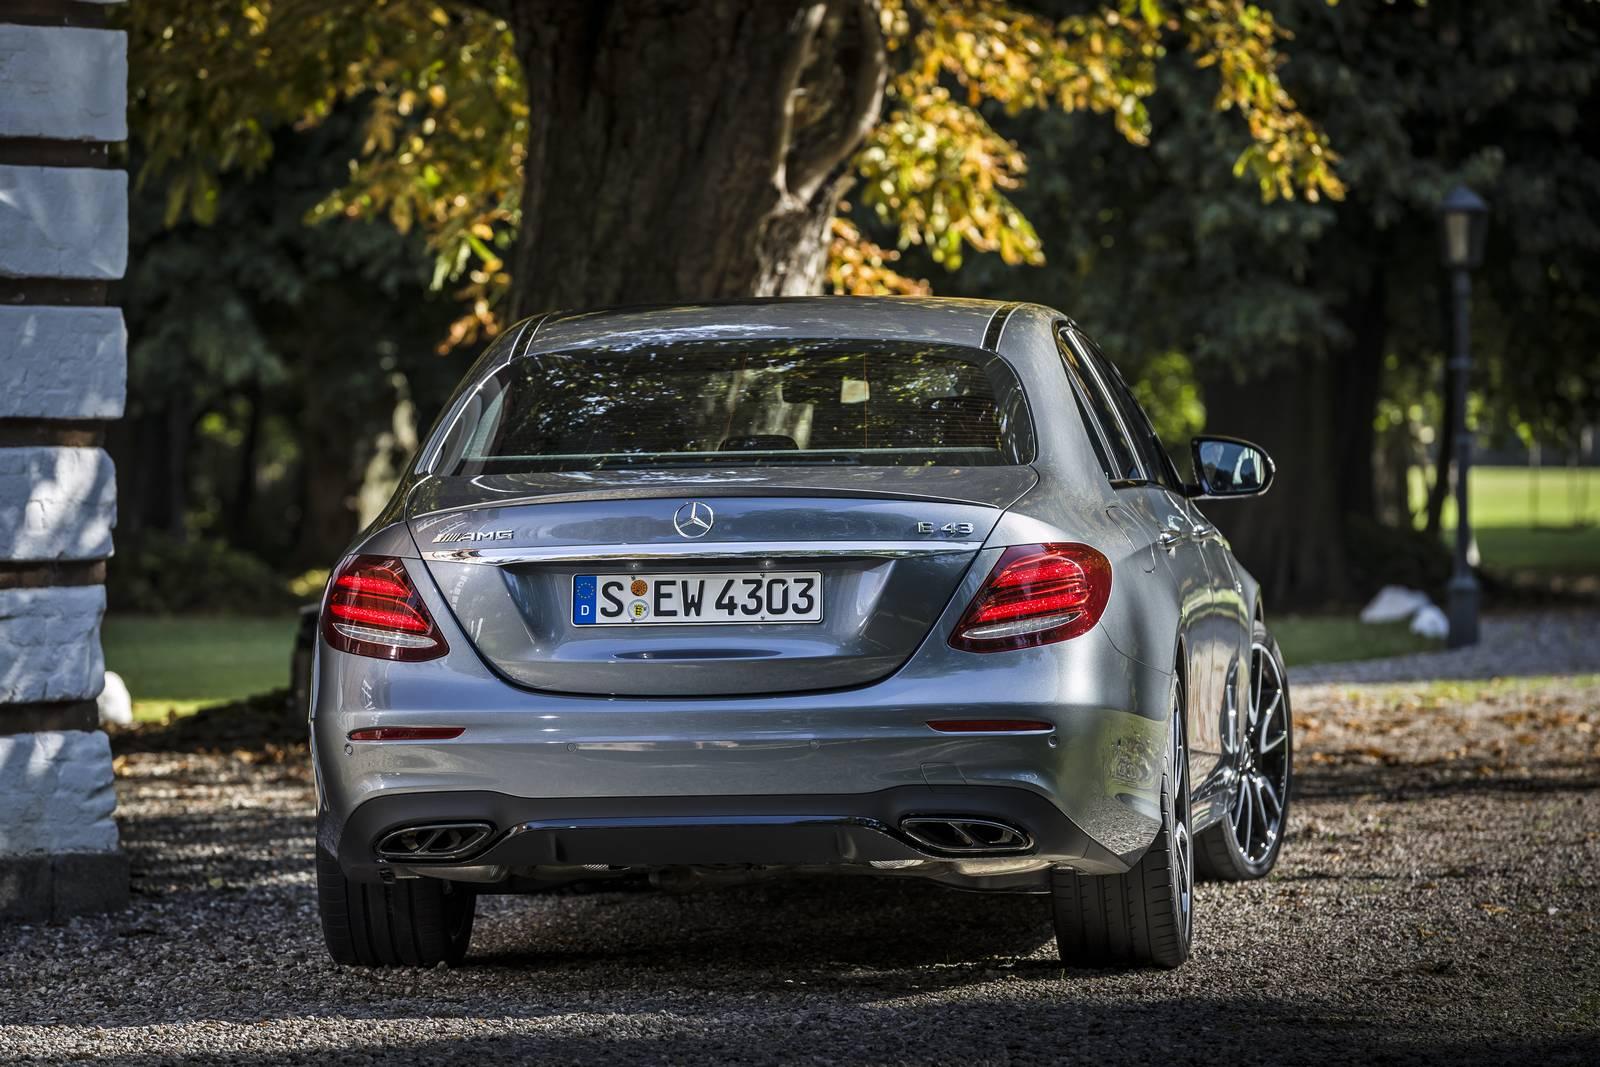 http://gtspirit.com/wp-content/uploads/2016/09/Selenite-Grey-Mercedes-AMG-E43-4.jpg